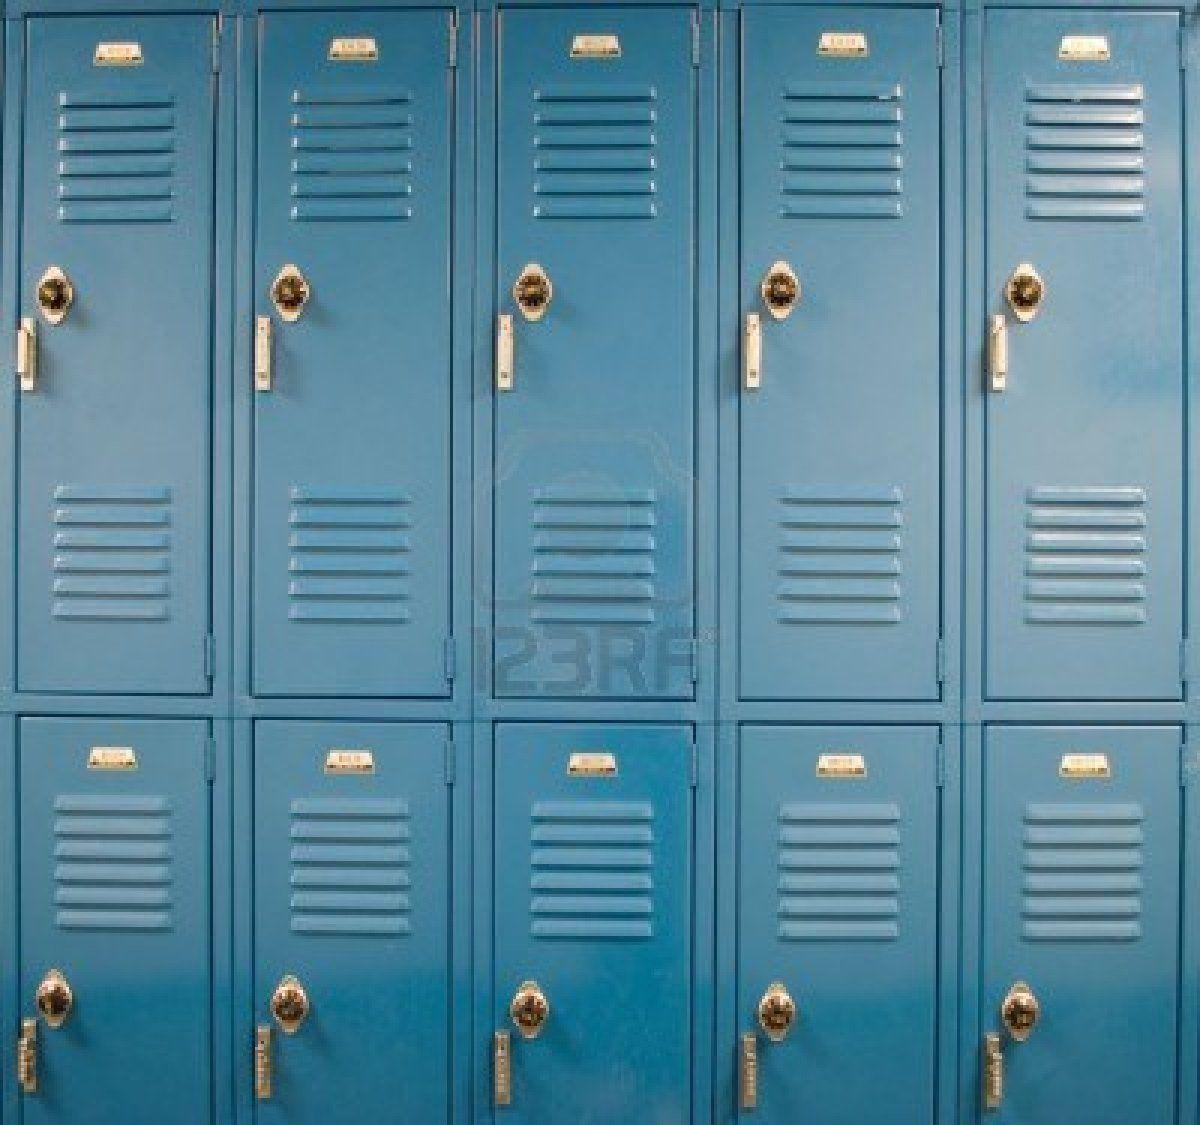 4577534 Blue School Lockers In A Hallway With Locks Jpg 1200 1125 School Lockers Lockers Printed Backdrops